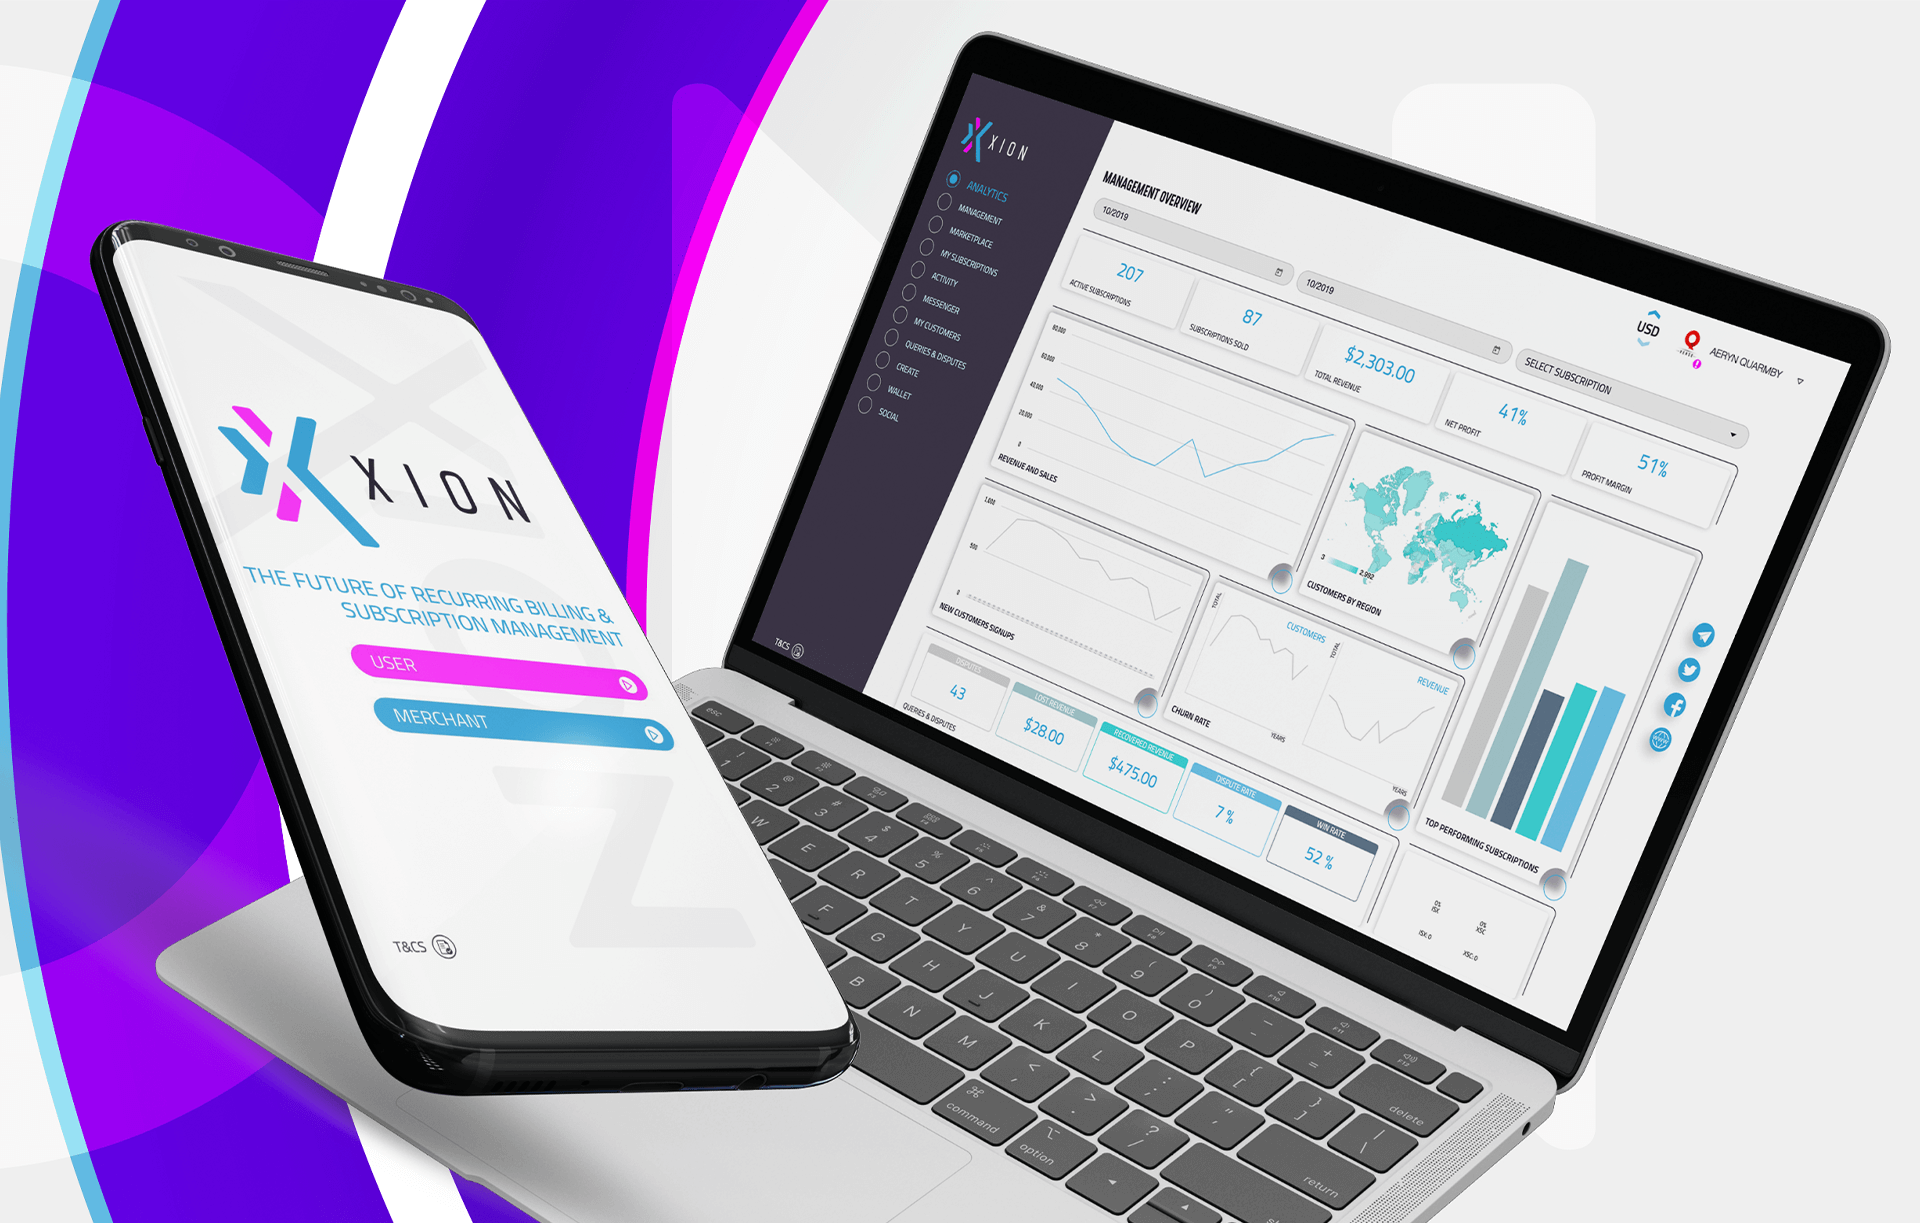 Xion-subscription-as-a-service-platform